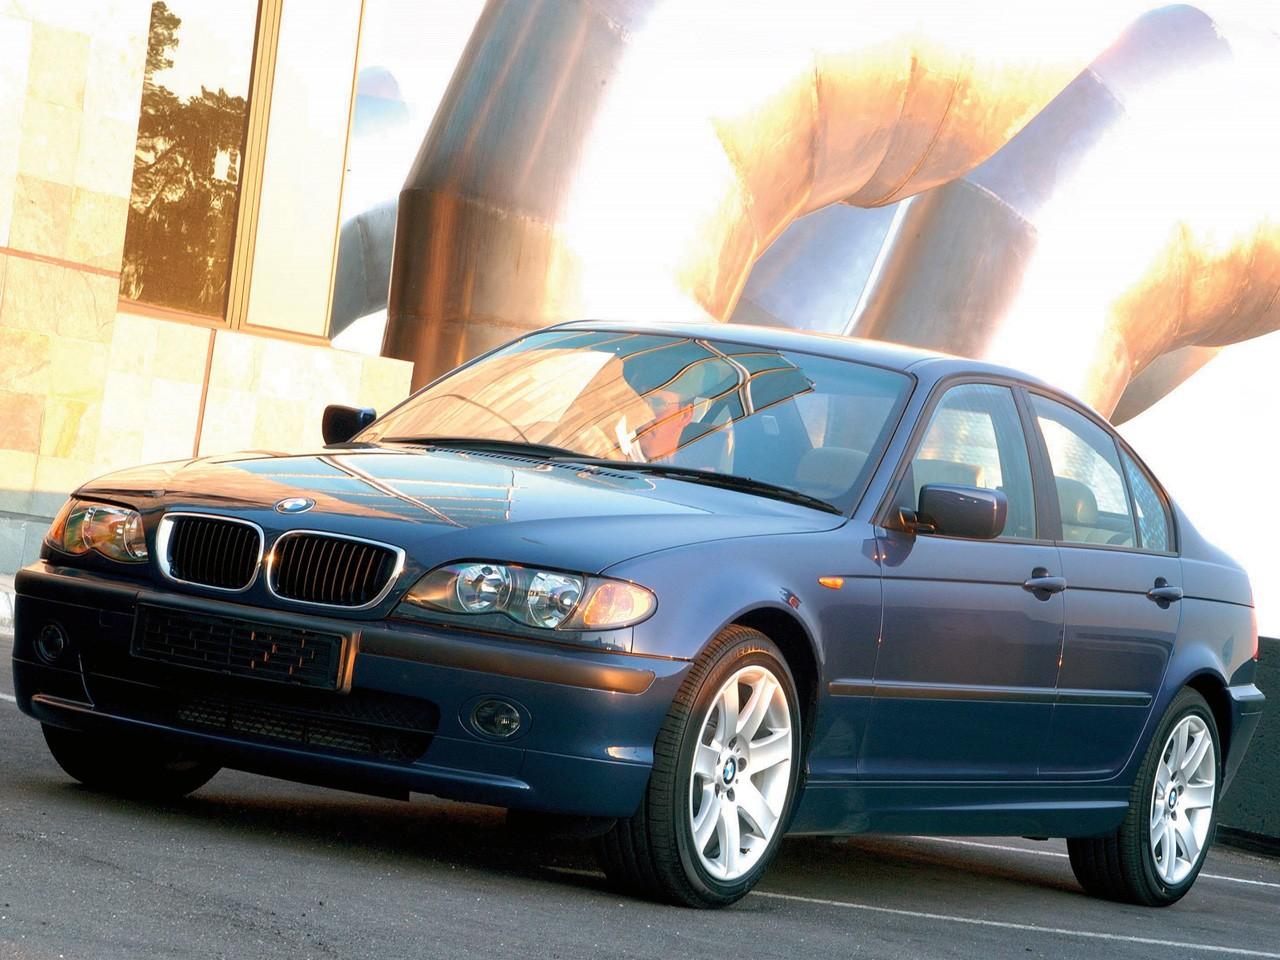 BMW Convertible bmw 320i 2001 specs BMW 3 Series (E46) specs - 2002, 2003, 2004, 2005 - autoevolution